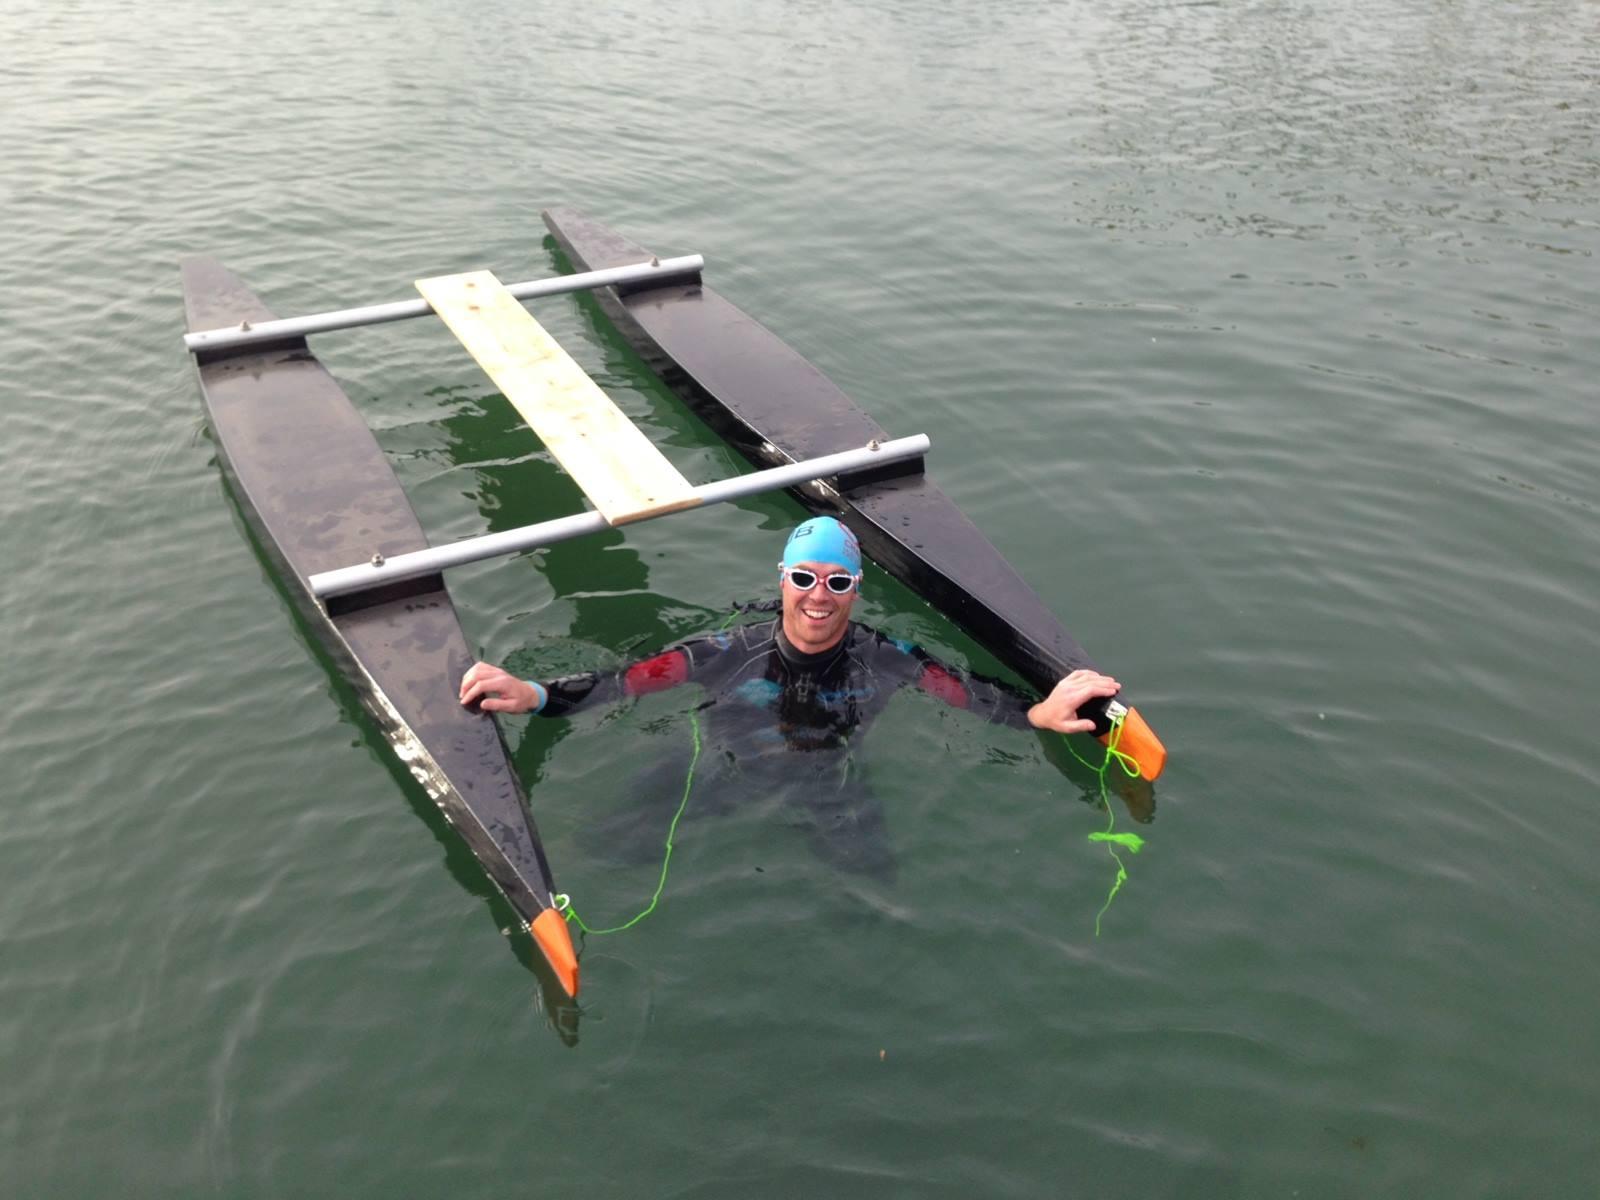 Sea test with the catamaran